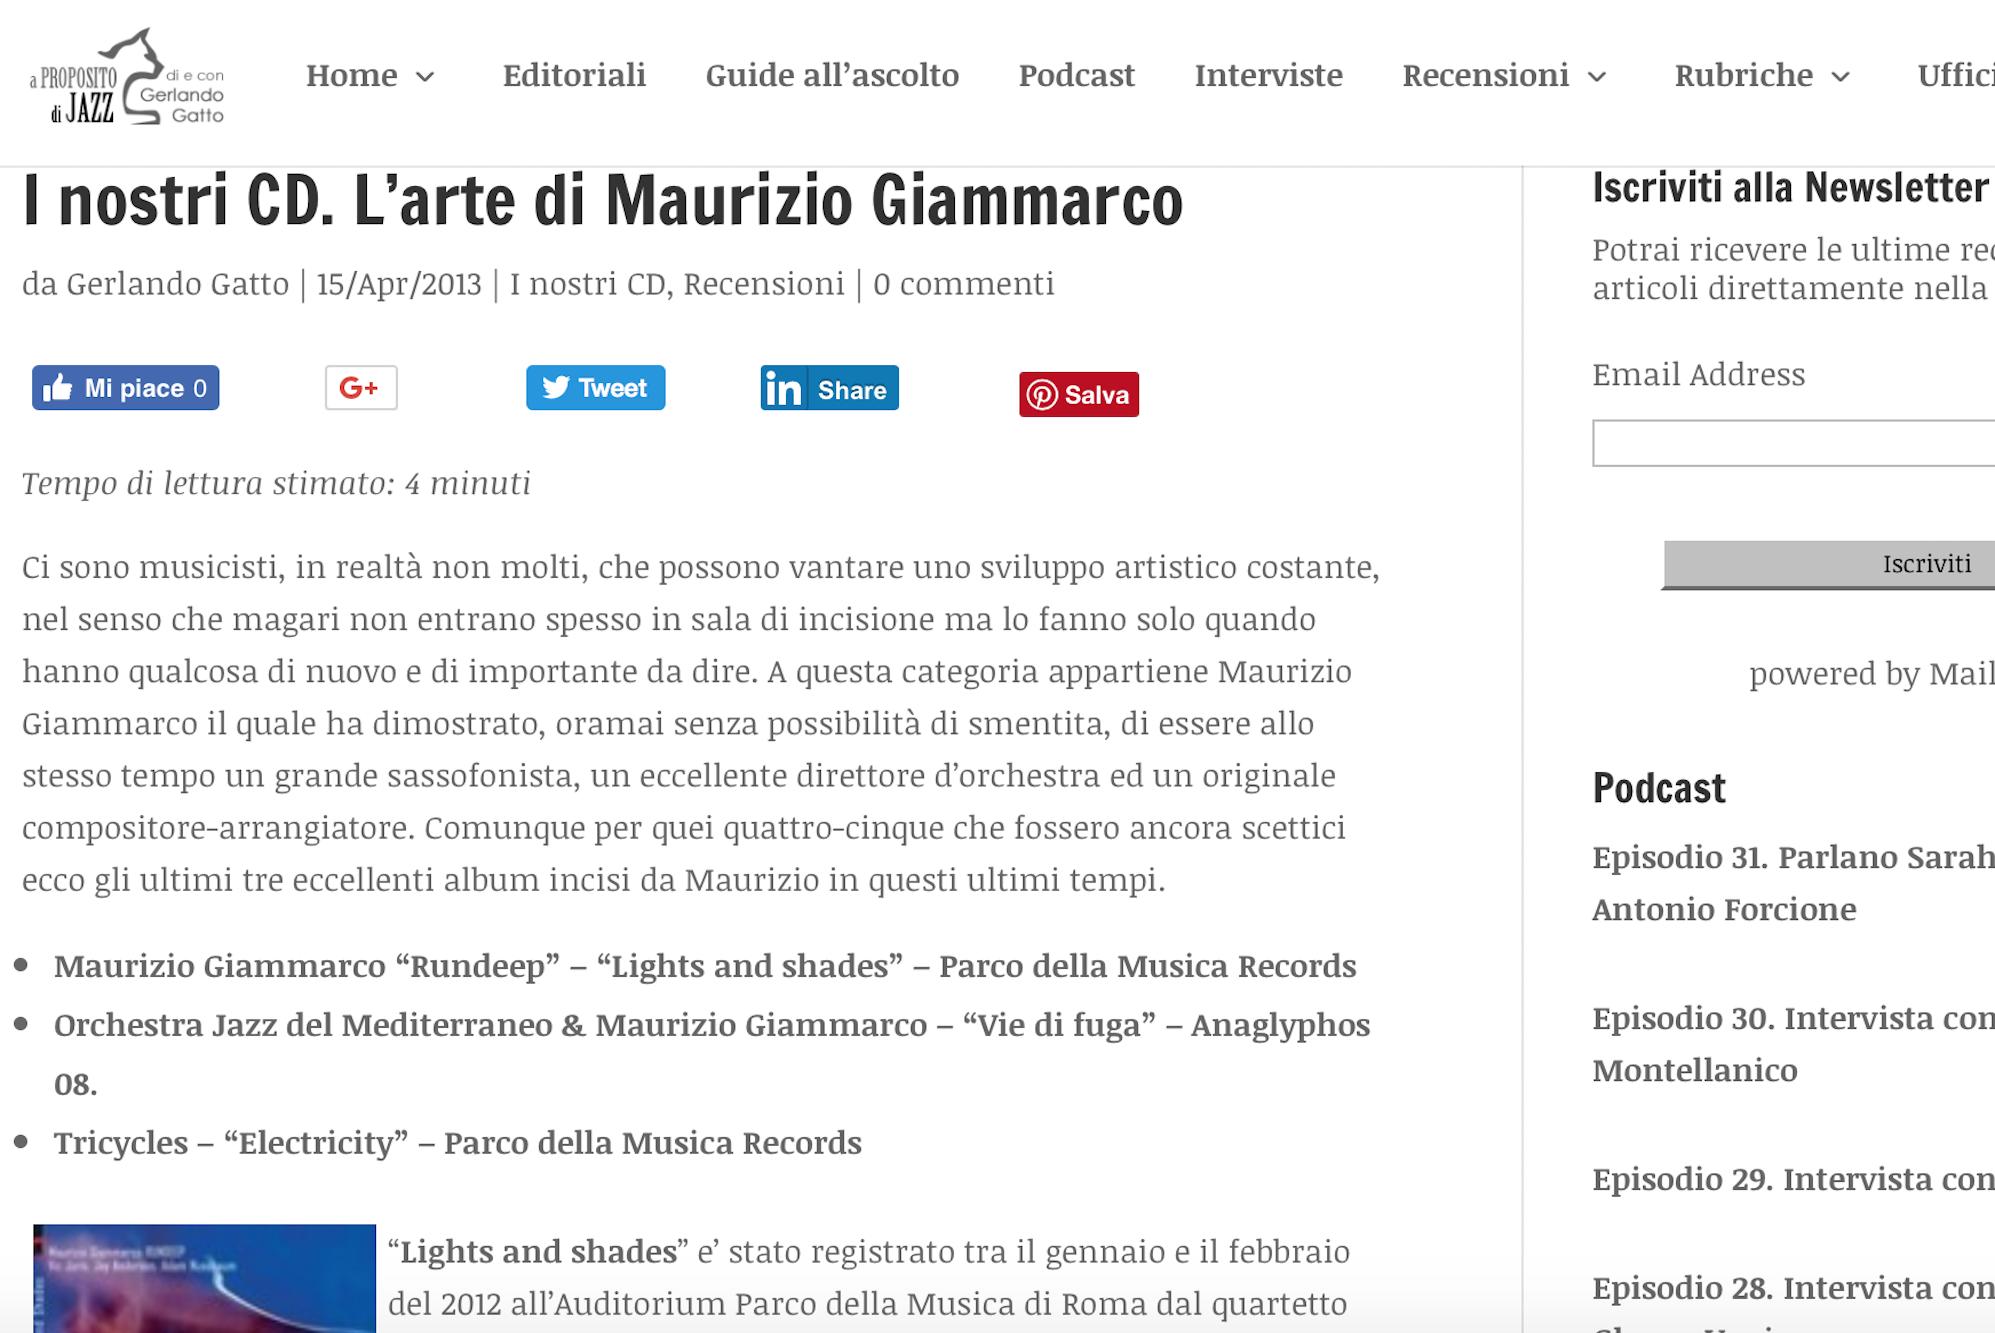 I nostri Cd. L'arte di Maurizio Giammarco – A proposito di Jazz